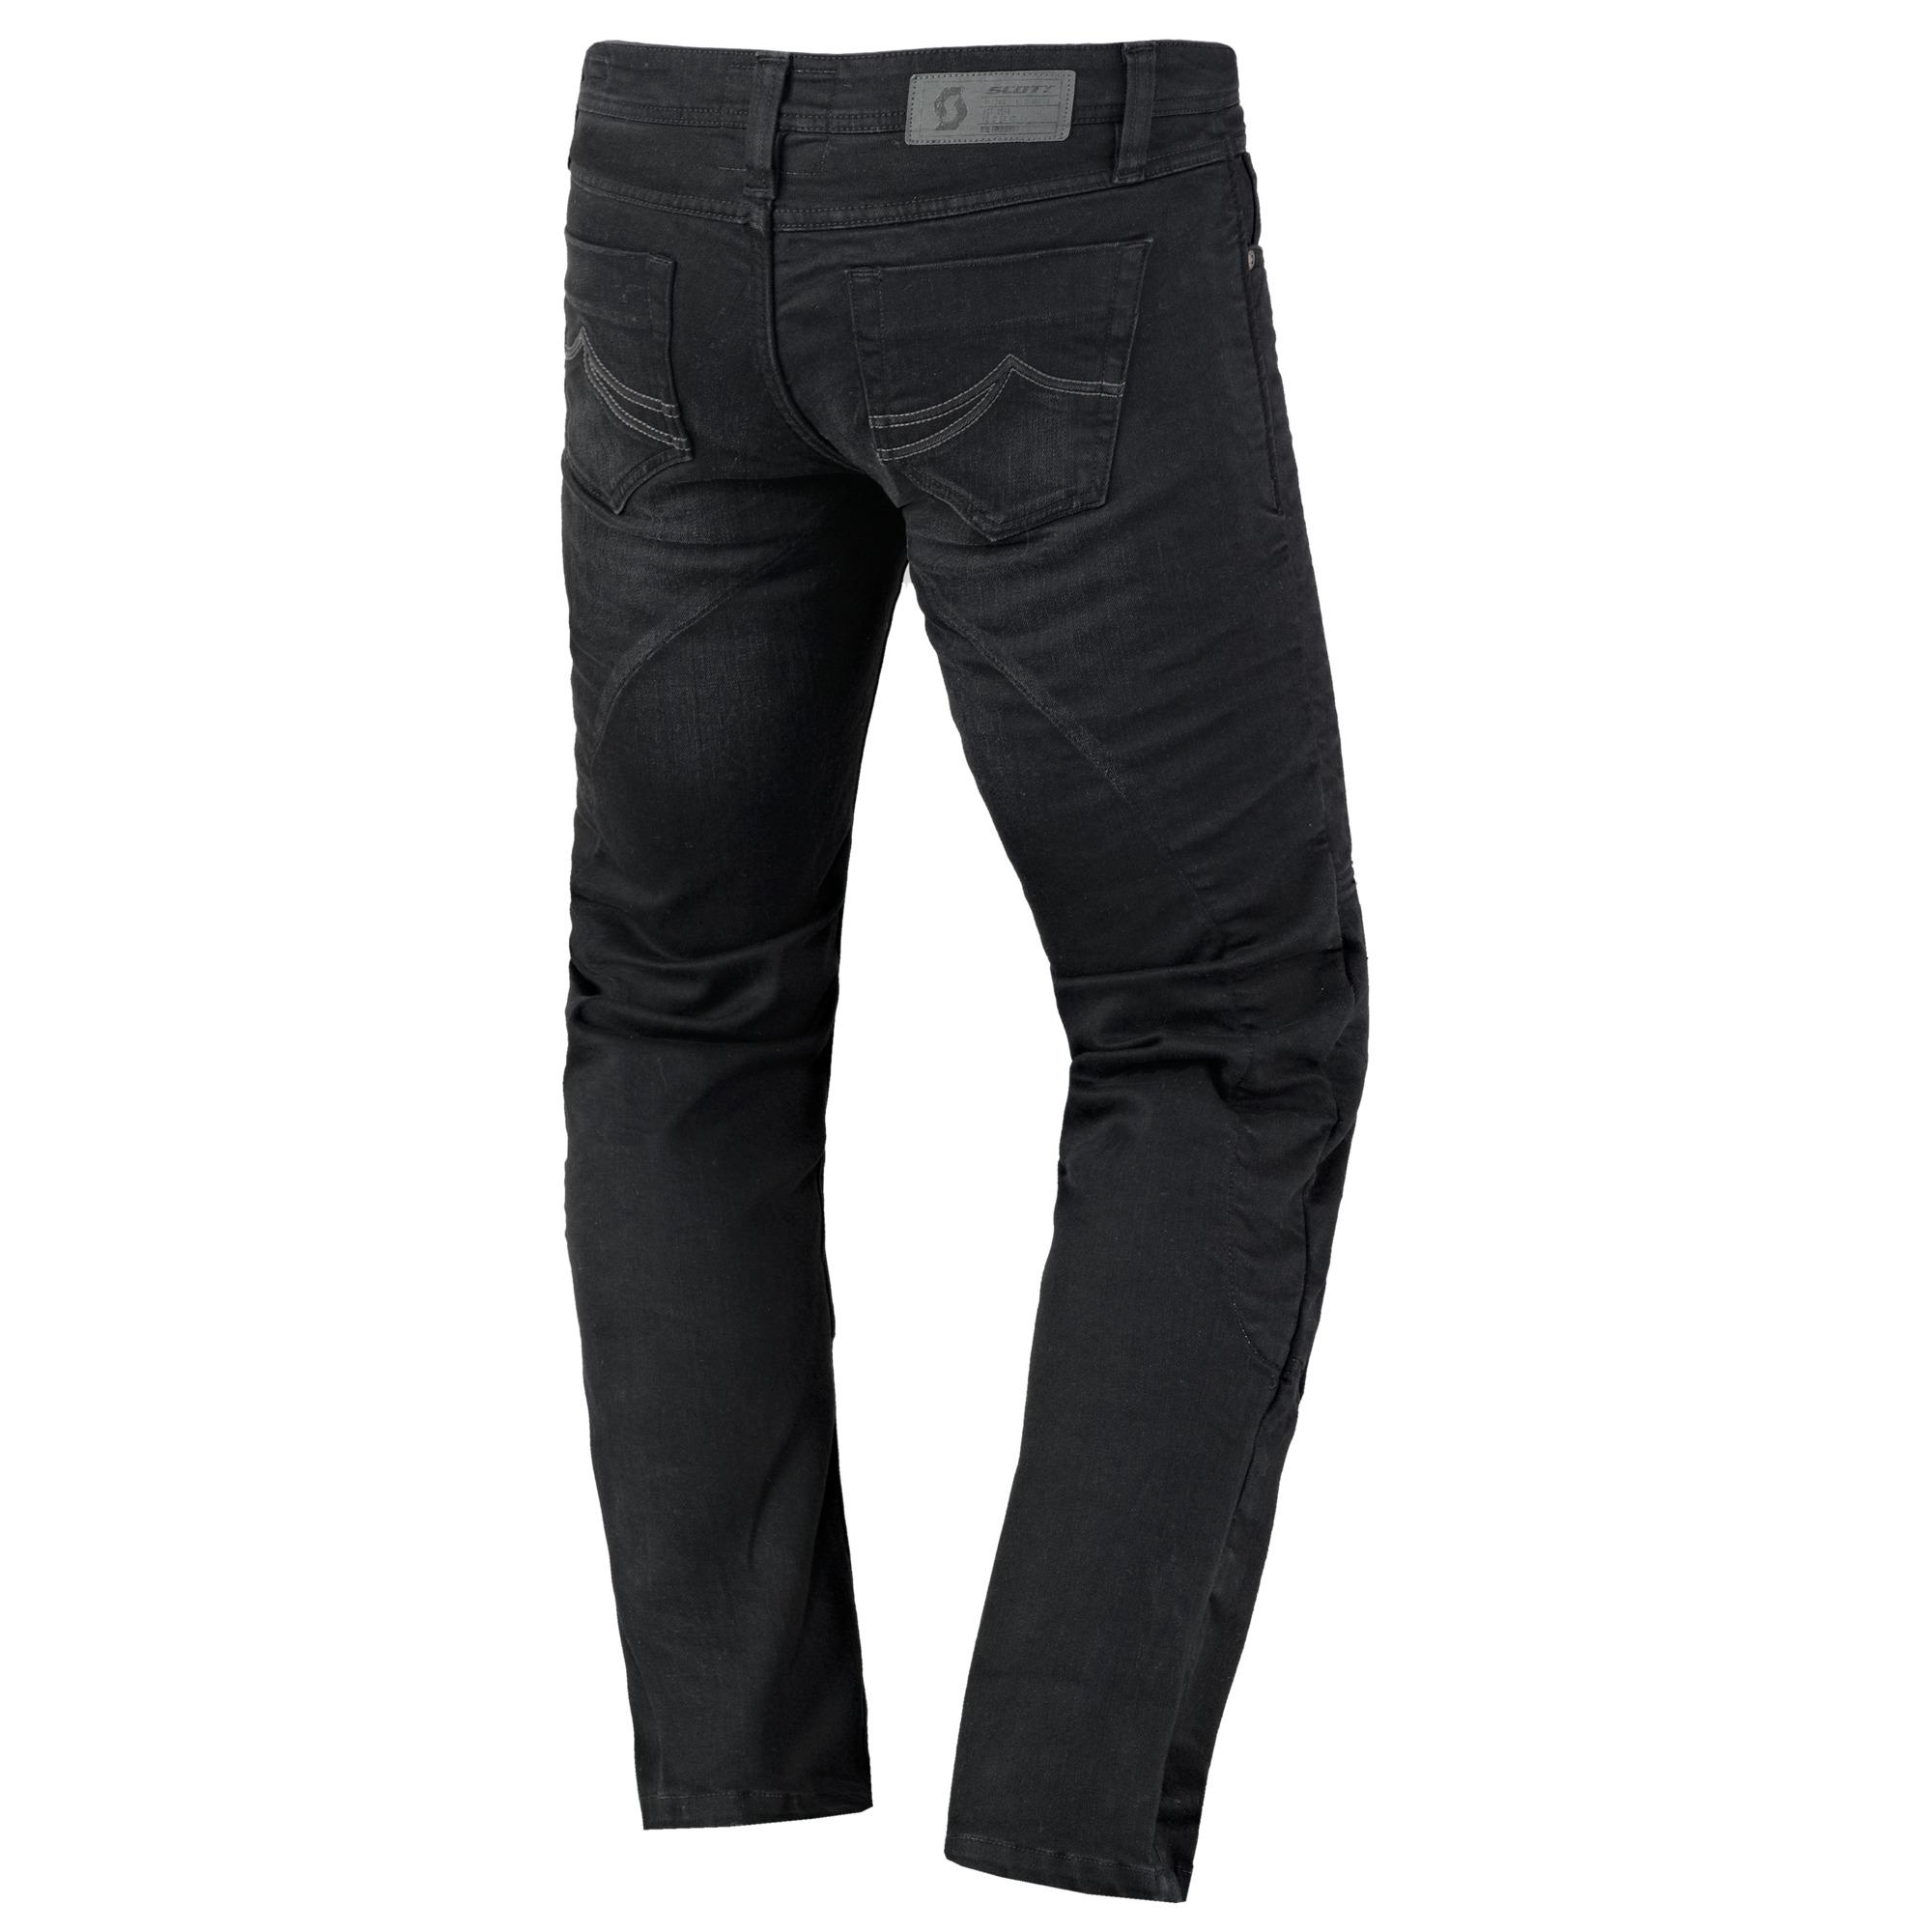 moto-axxe-pantalon-jean-scott-denim-stretch-lady-noir-femme -renforce-aramide-dos.jpg 37c1ff354a2